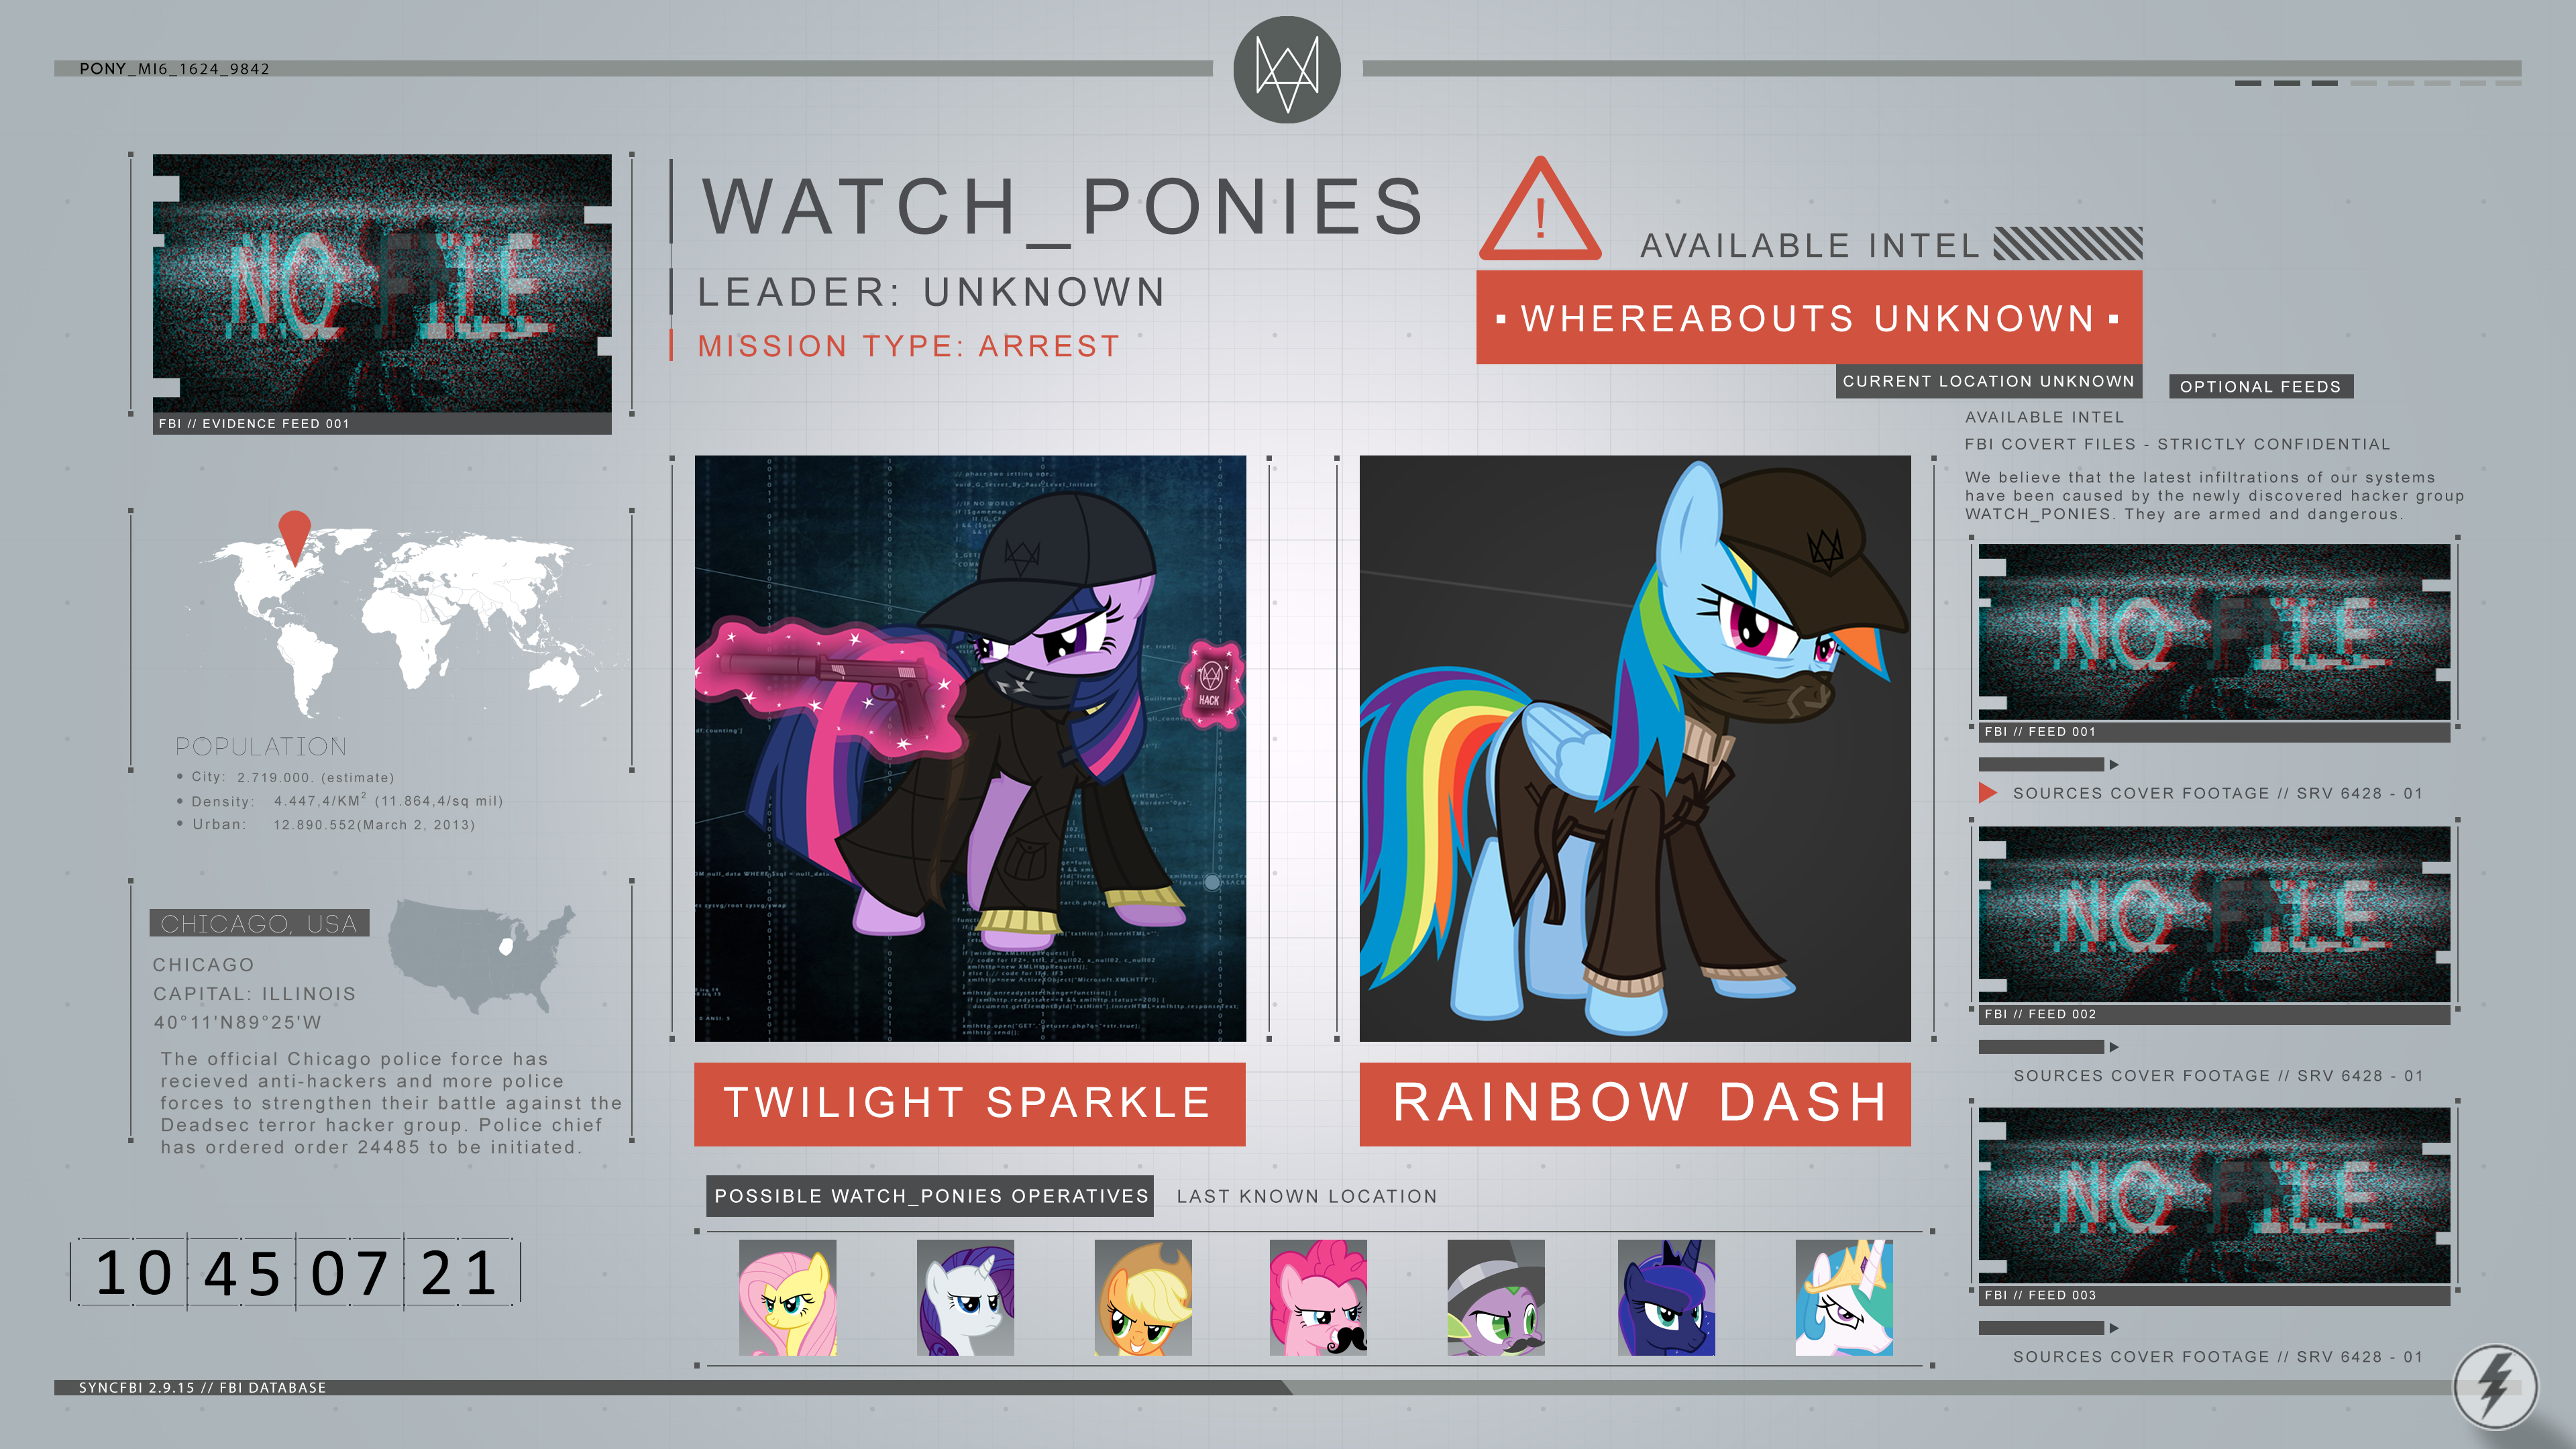 Watch Ponies Wallpaper by animepegasus, AxemGR, BlueAthomBomb, Bolteyboltt, eugene-joe-c, IIThunderboltII, Jackos92, Korsoo, landBOOM, Lexuzieel and SpinnyHat